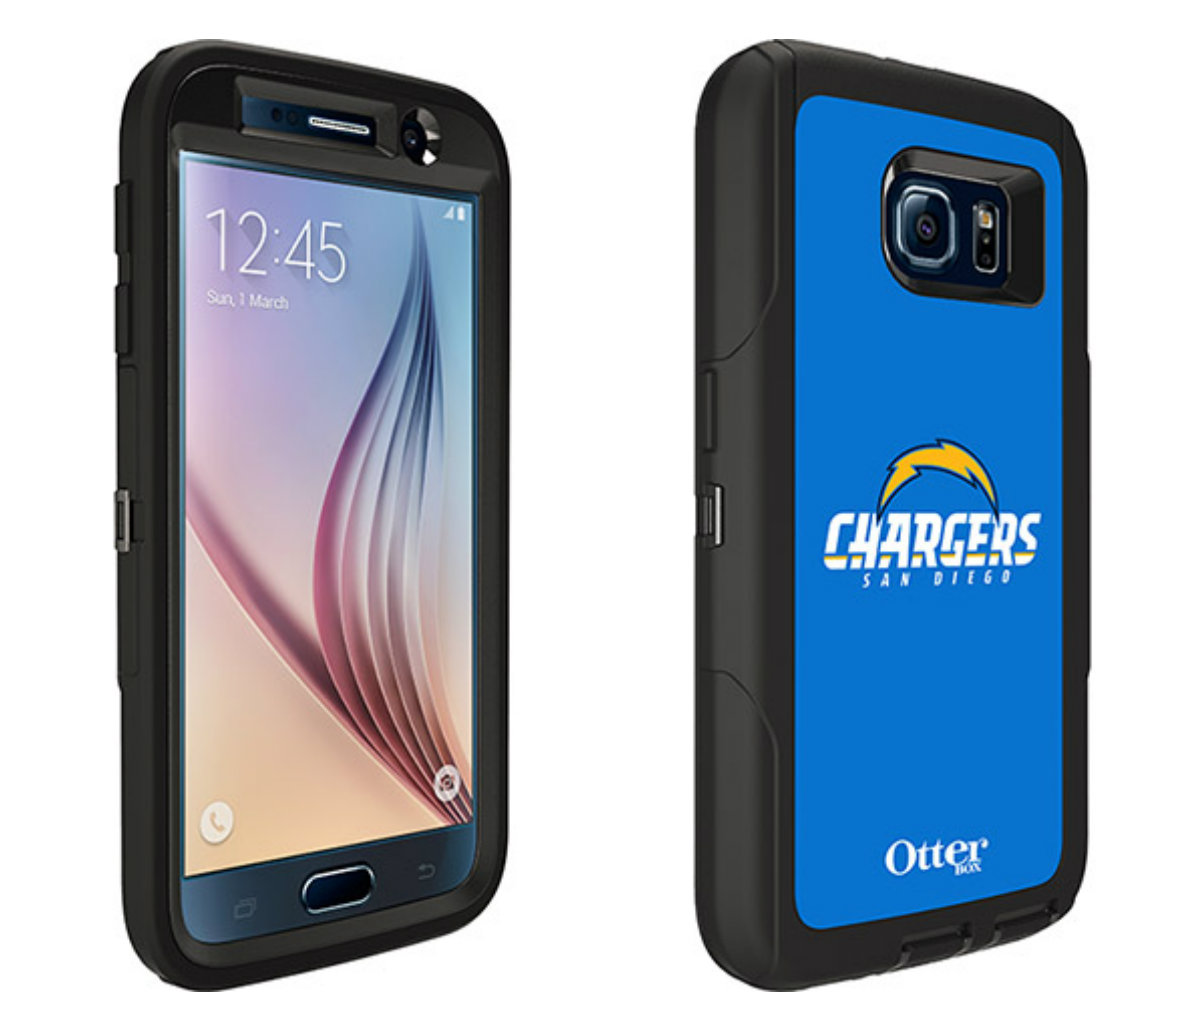 Galaxy S6 NFL Defender OtterBox case_5